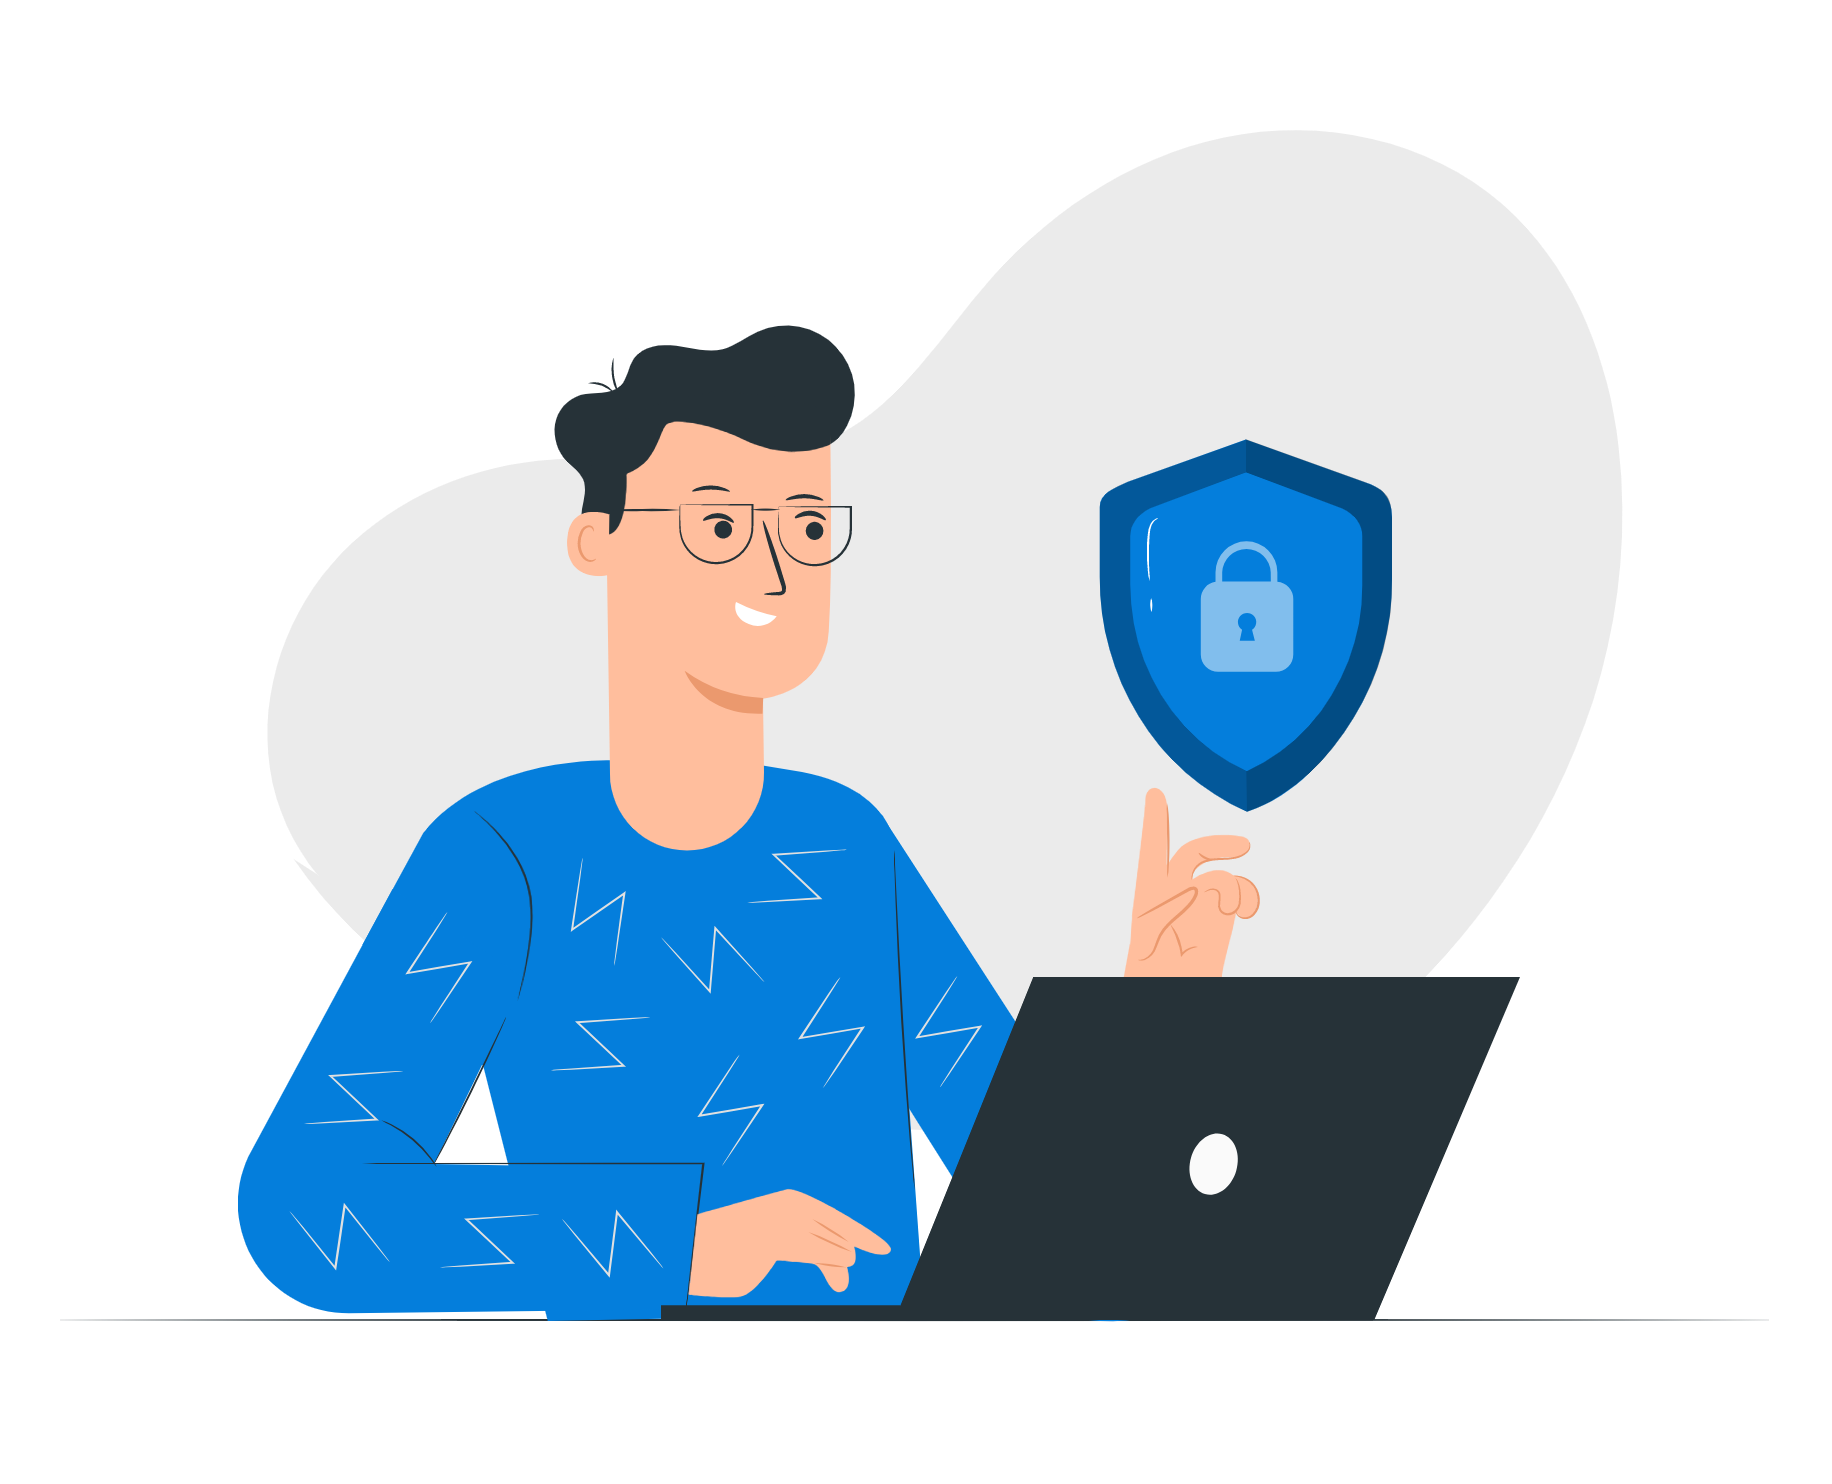 Secure-data-pana2.png